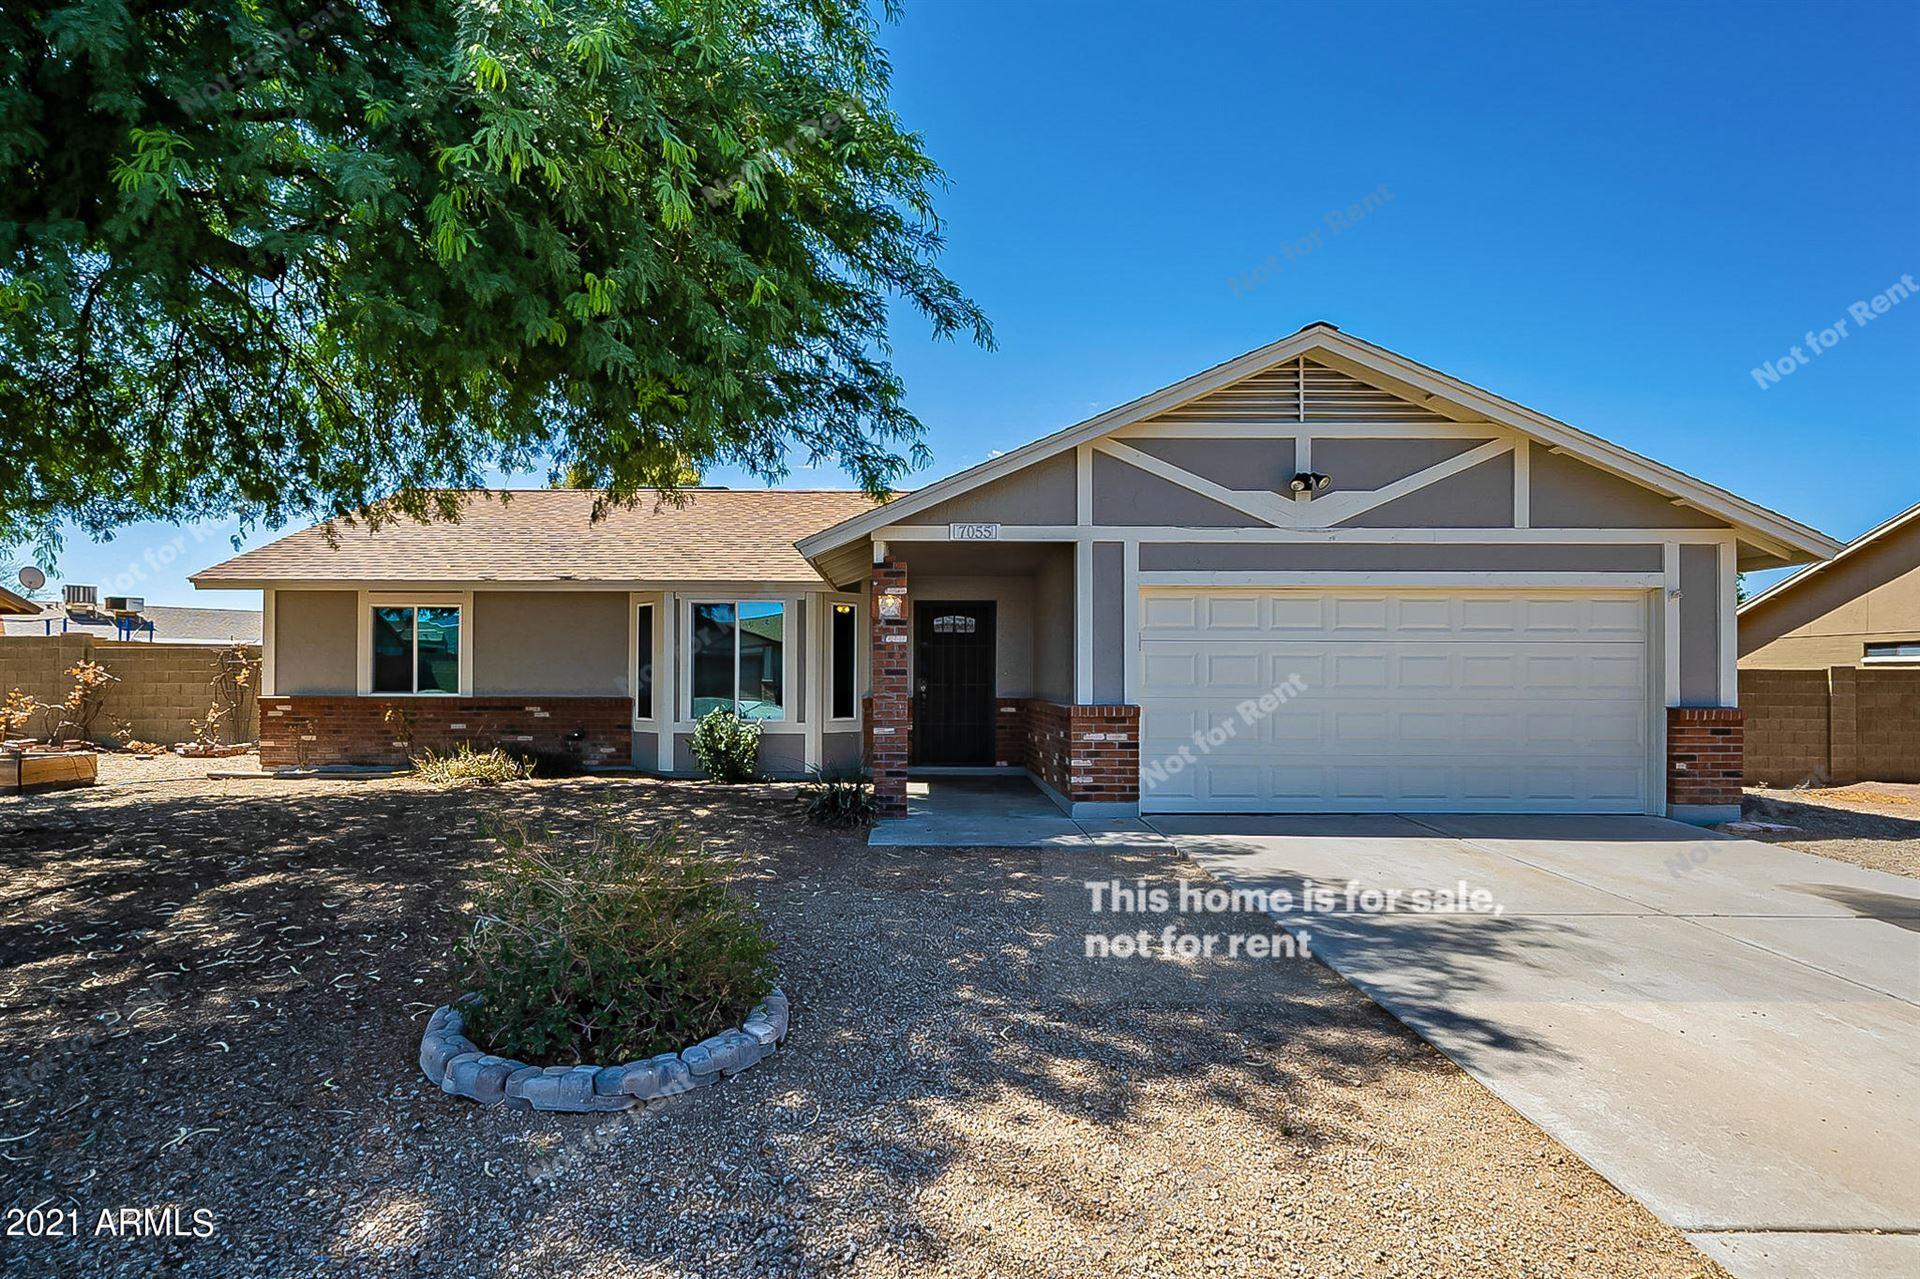 7055 E GARY Street, Mesa, AZ 85207 - #: 6256542